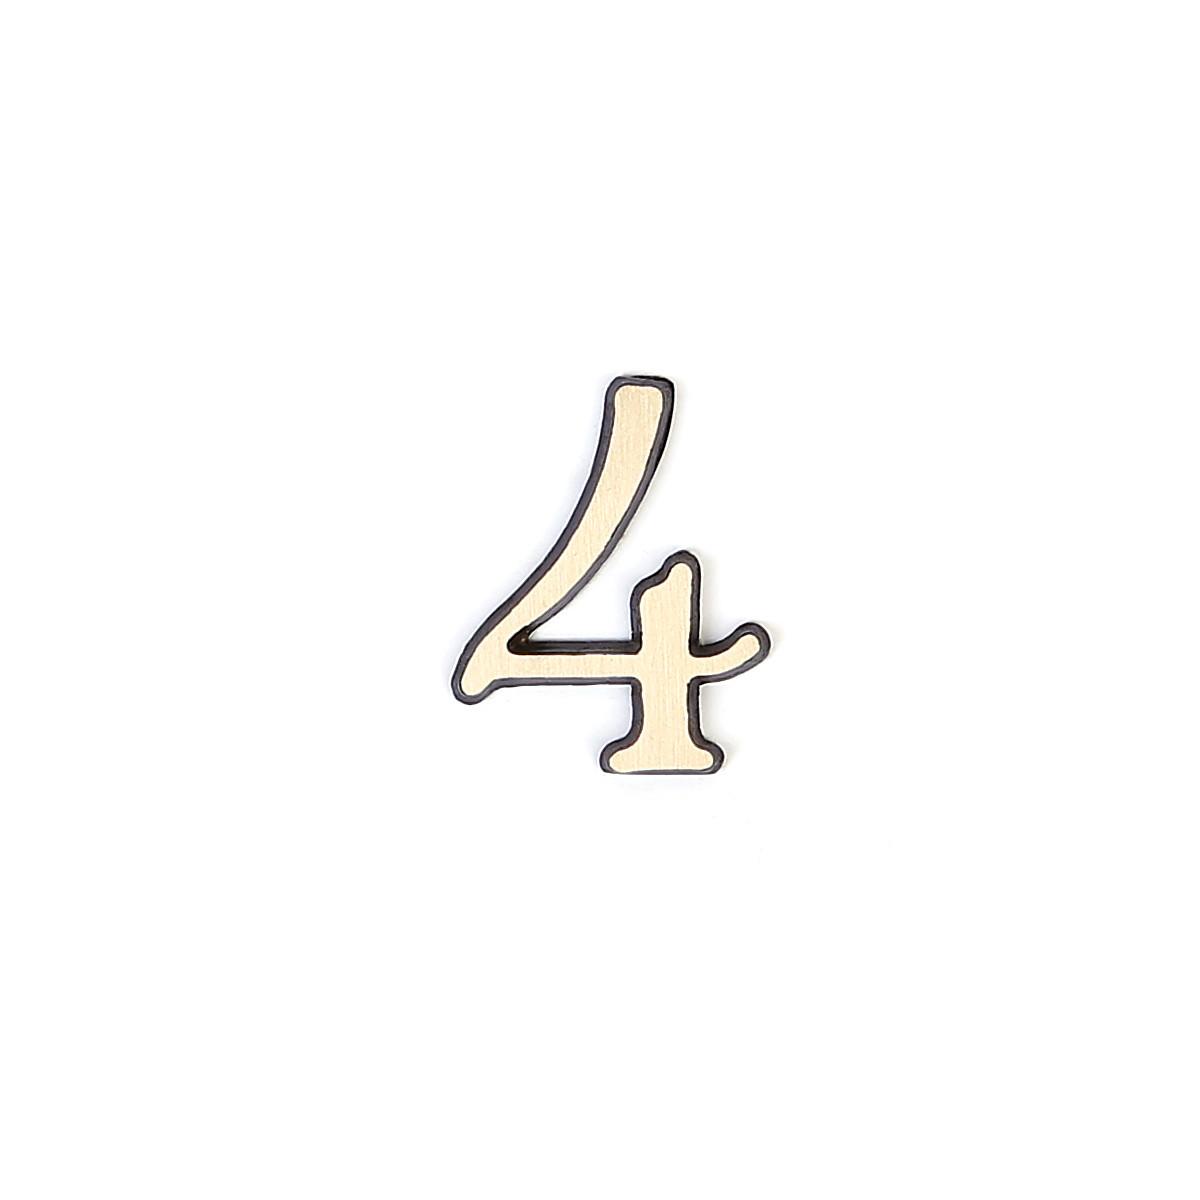 Номер из латуни на дверь Larvij цифра 4 антик бронза (LNB5 AB#4)